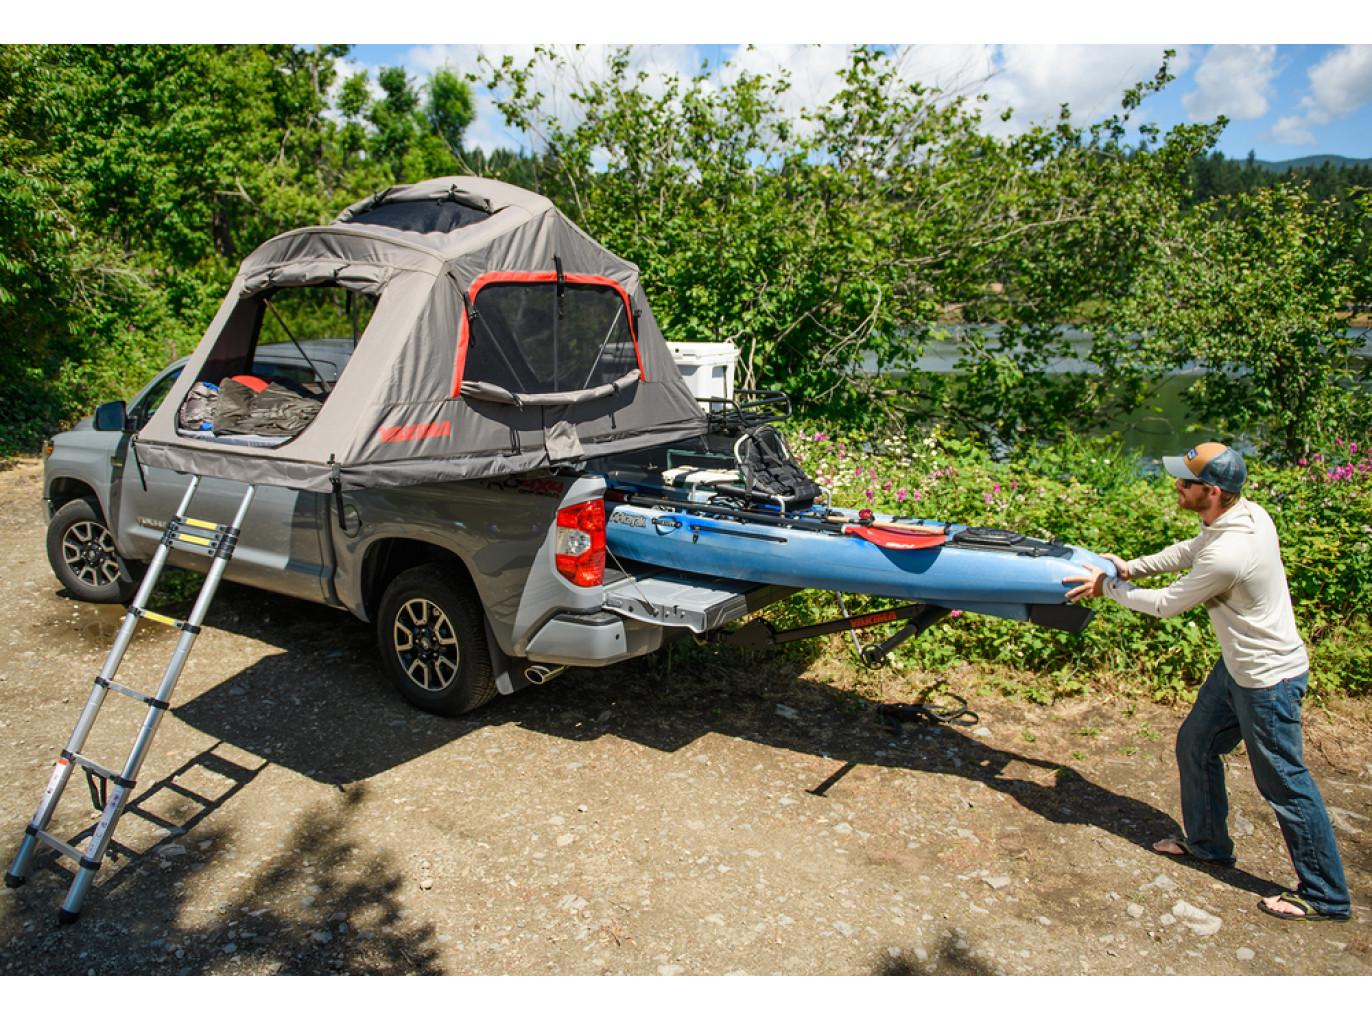 Yakima SkyRise HD Tent - LS7